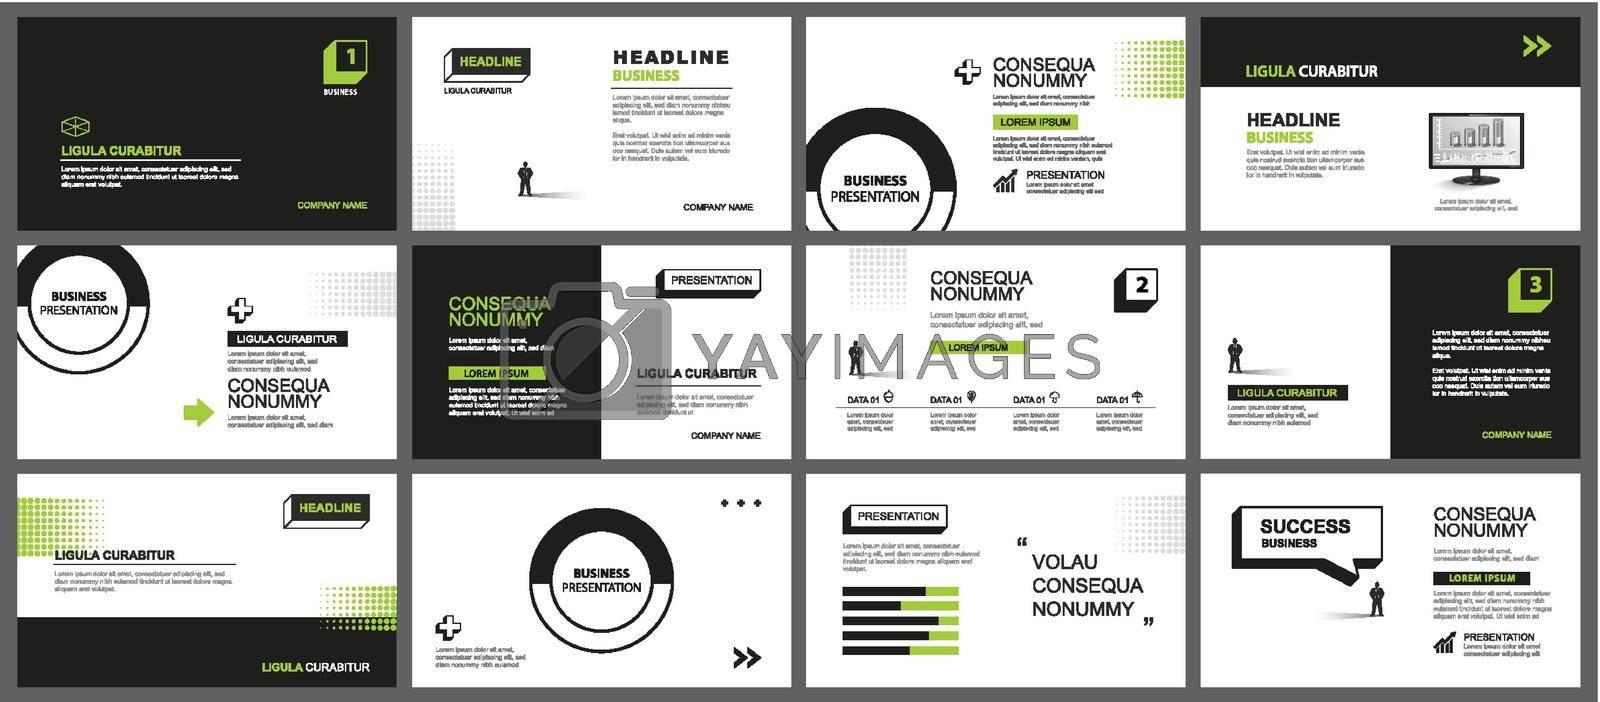 Presentation and slide layout background. Design green and black geometric template. Use for business keynote, presentation, slide, marketing, leaflet, advertising, template, modern style.